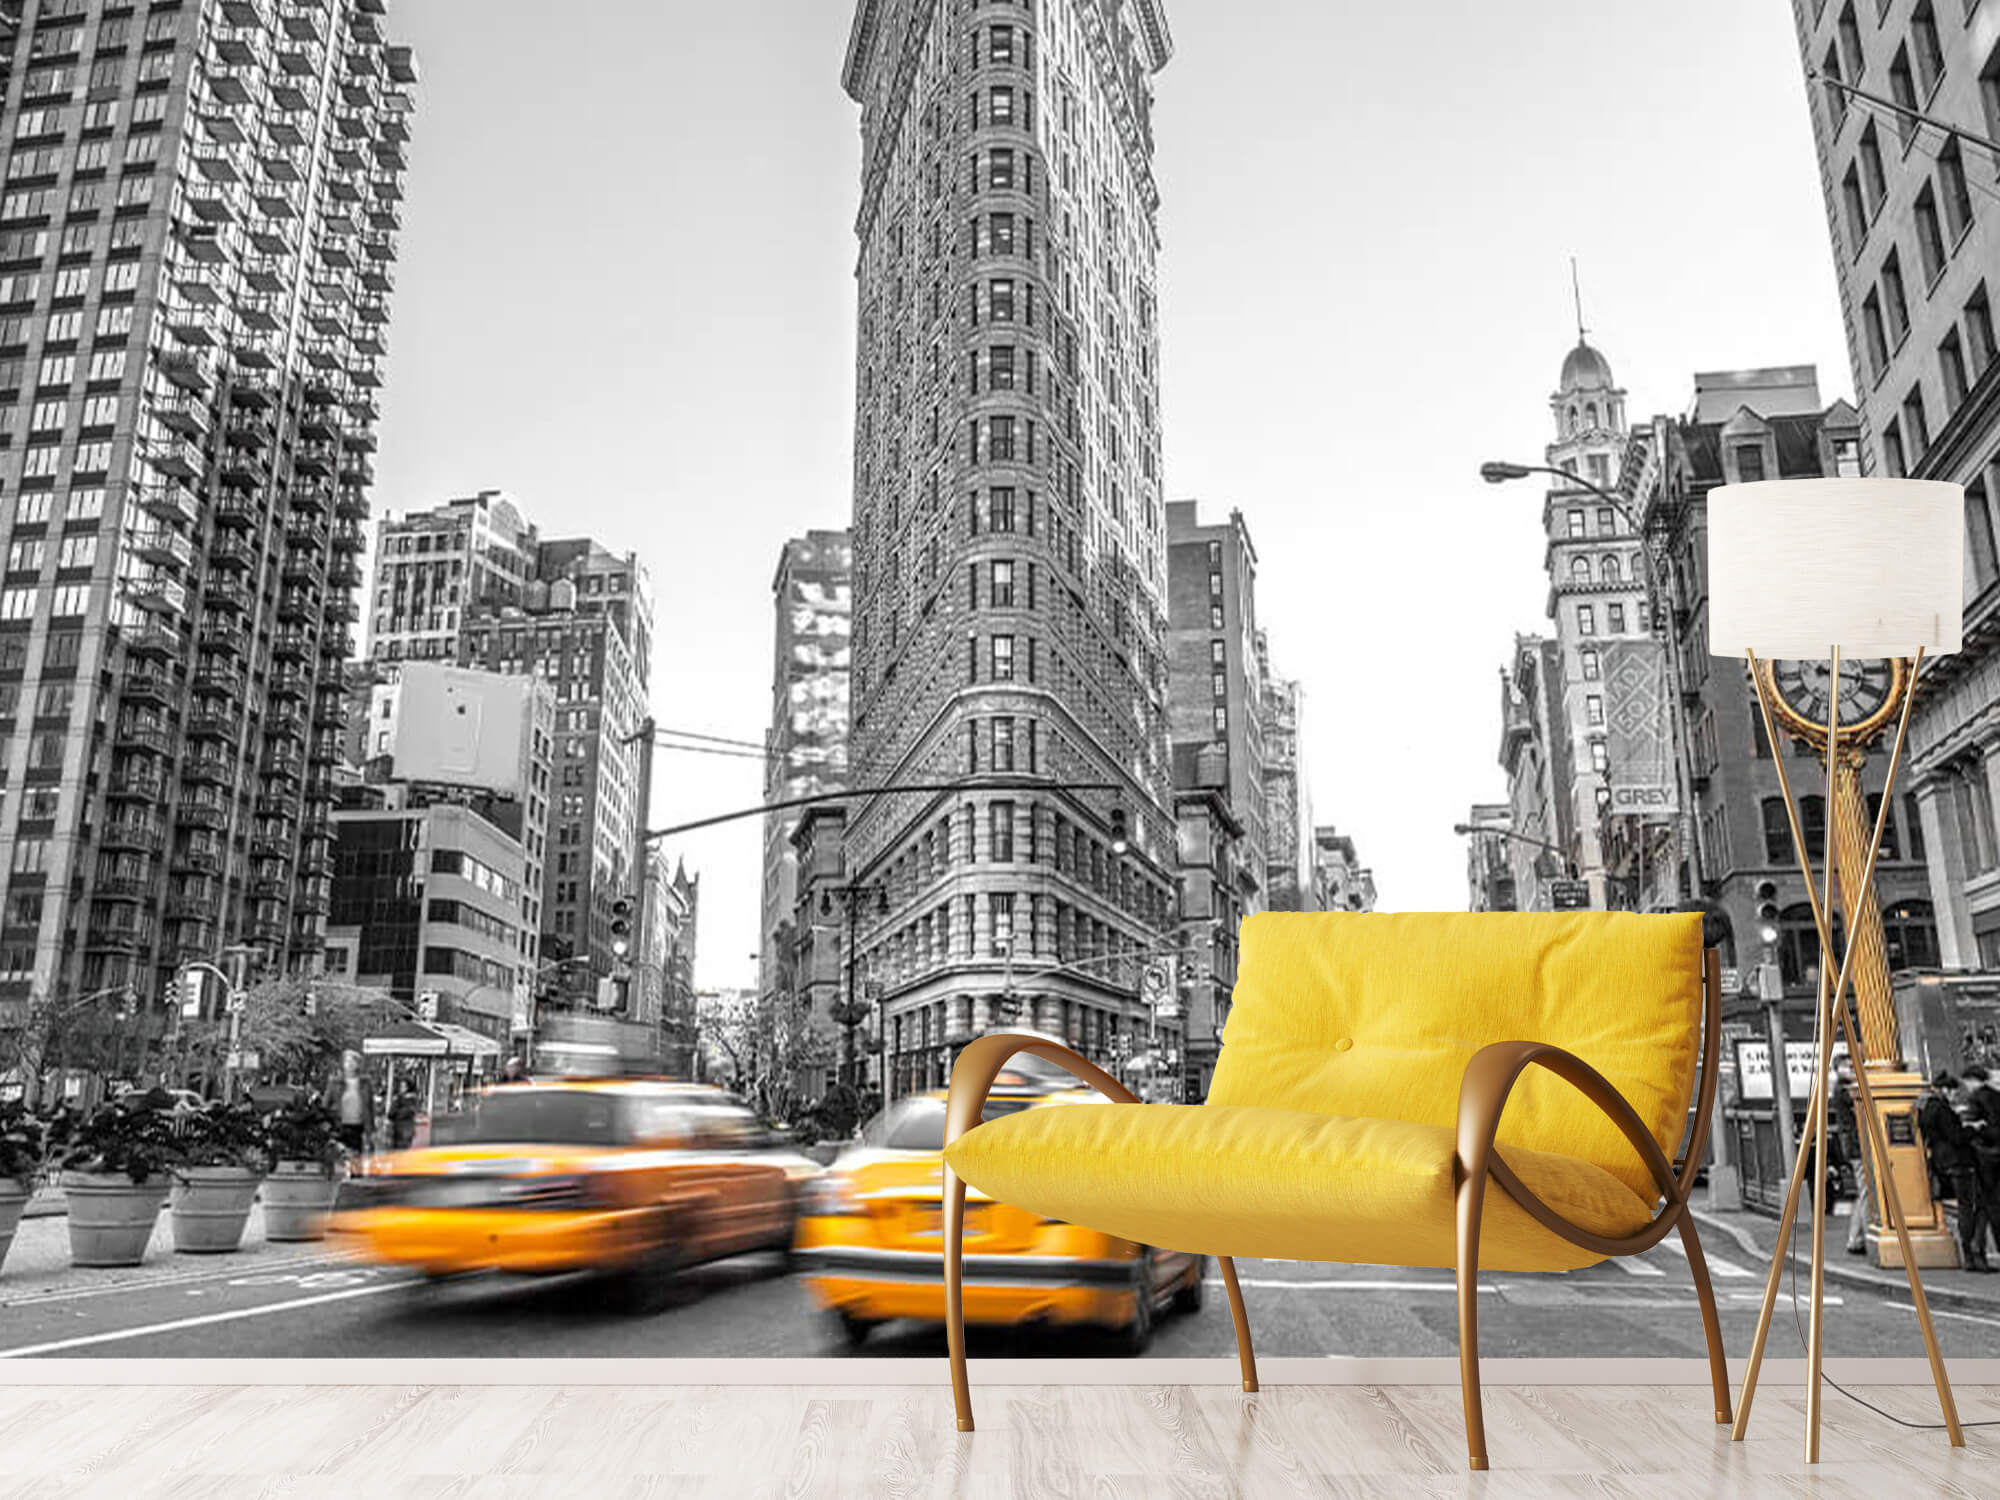 Rue animée à New York 13